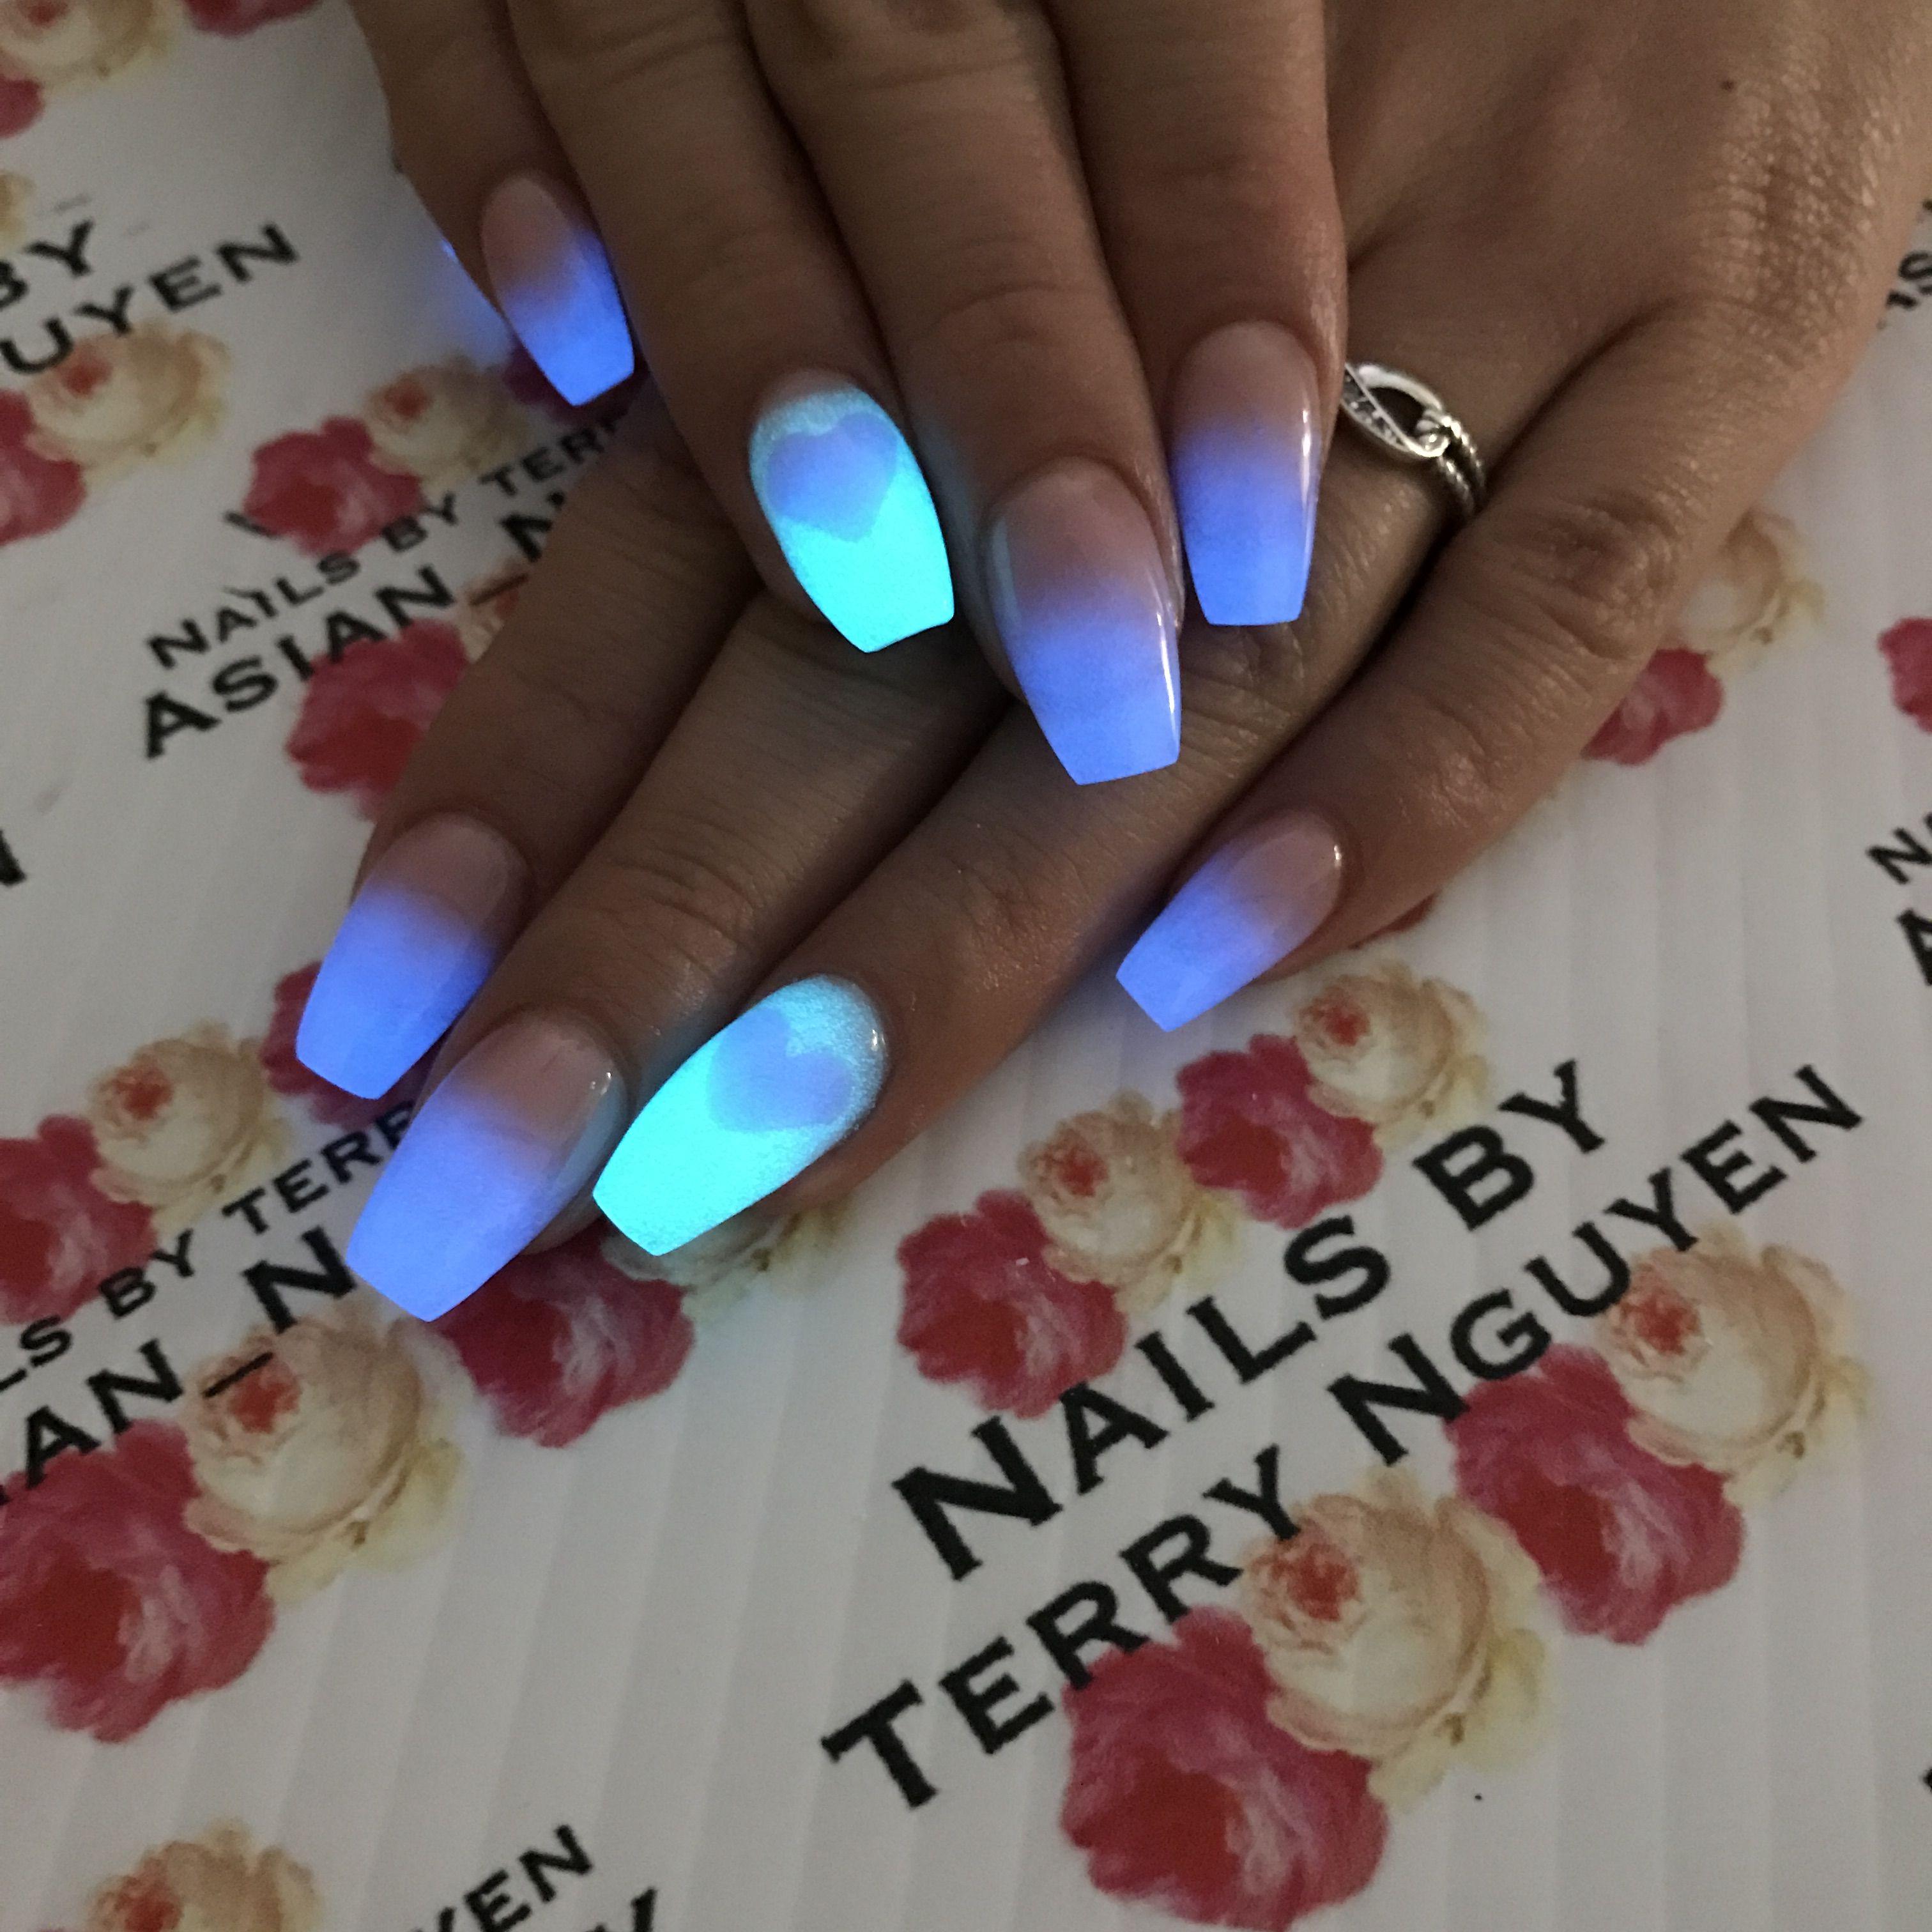 Glow-in-the-dark nails glow nails | Acrylic Rockstar Nails | Pinterest